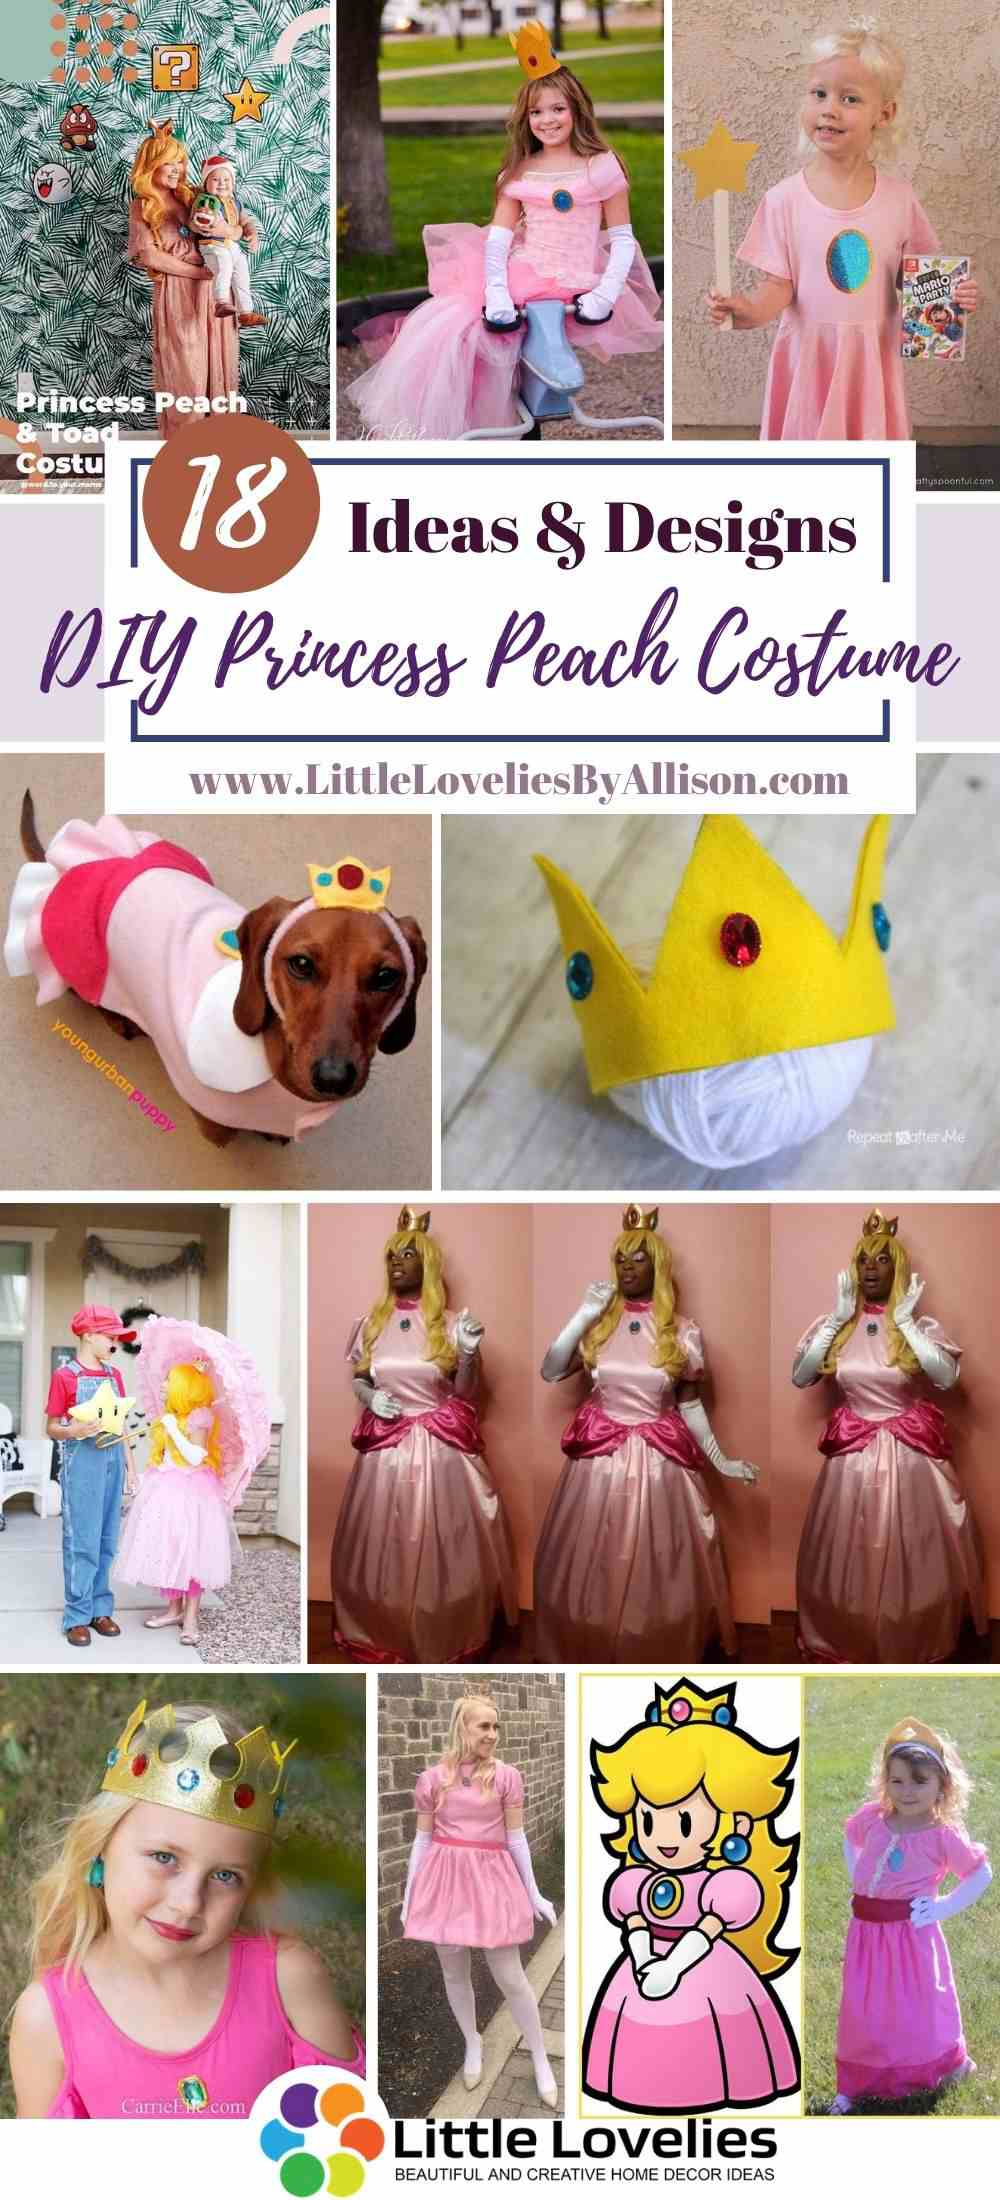 Best-DIY-Princess-Peach-Costume